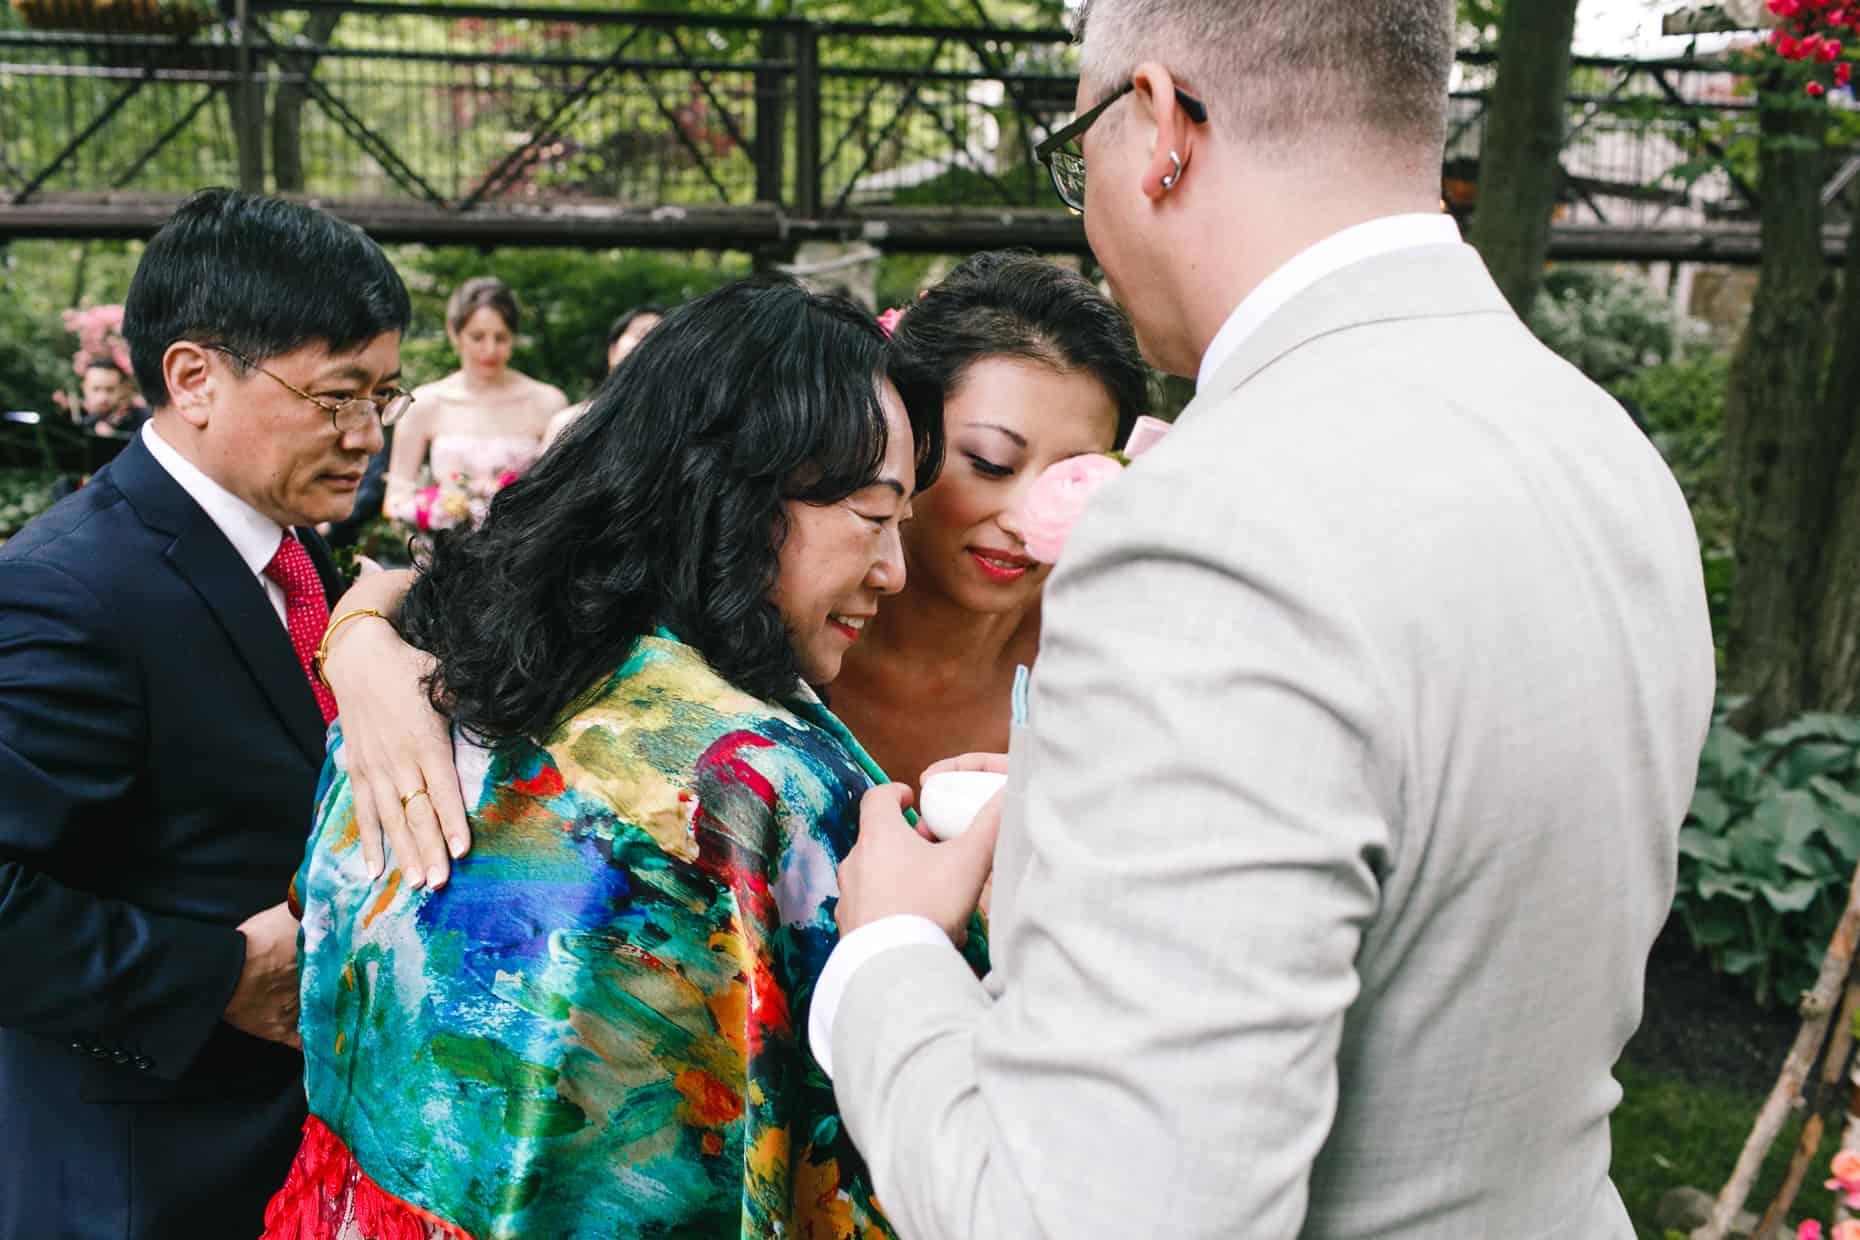 Wedding Ceremony Radnor